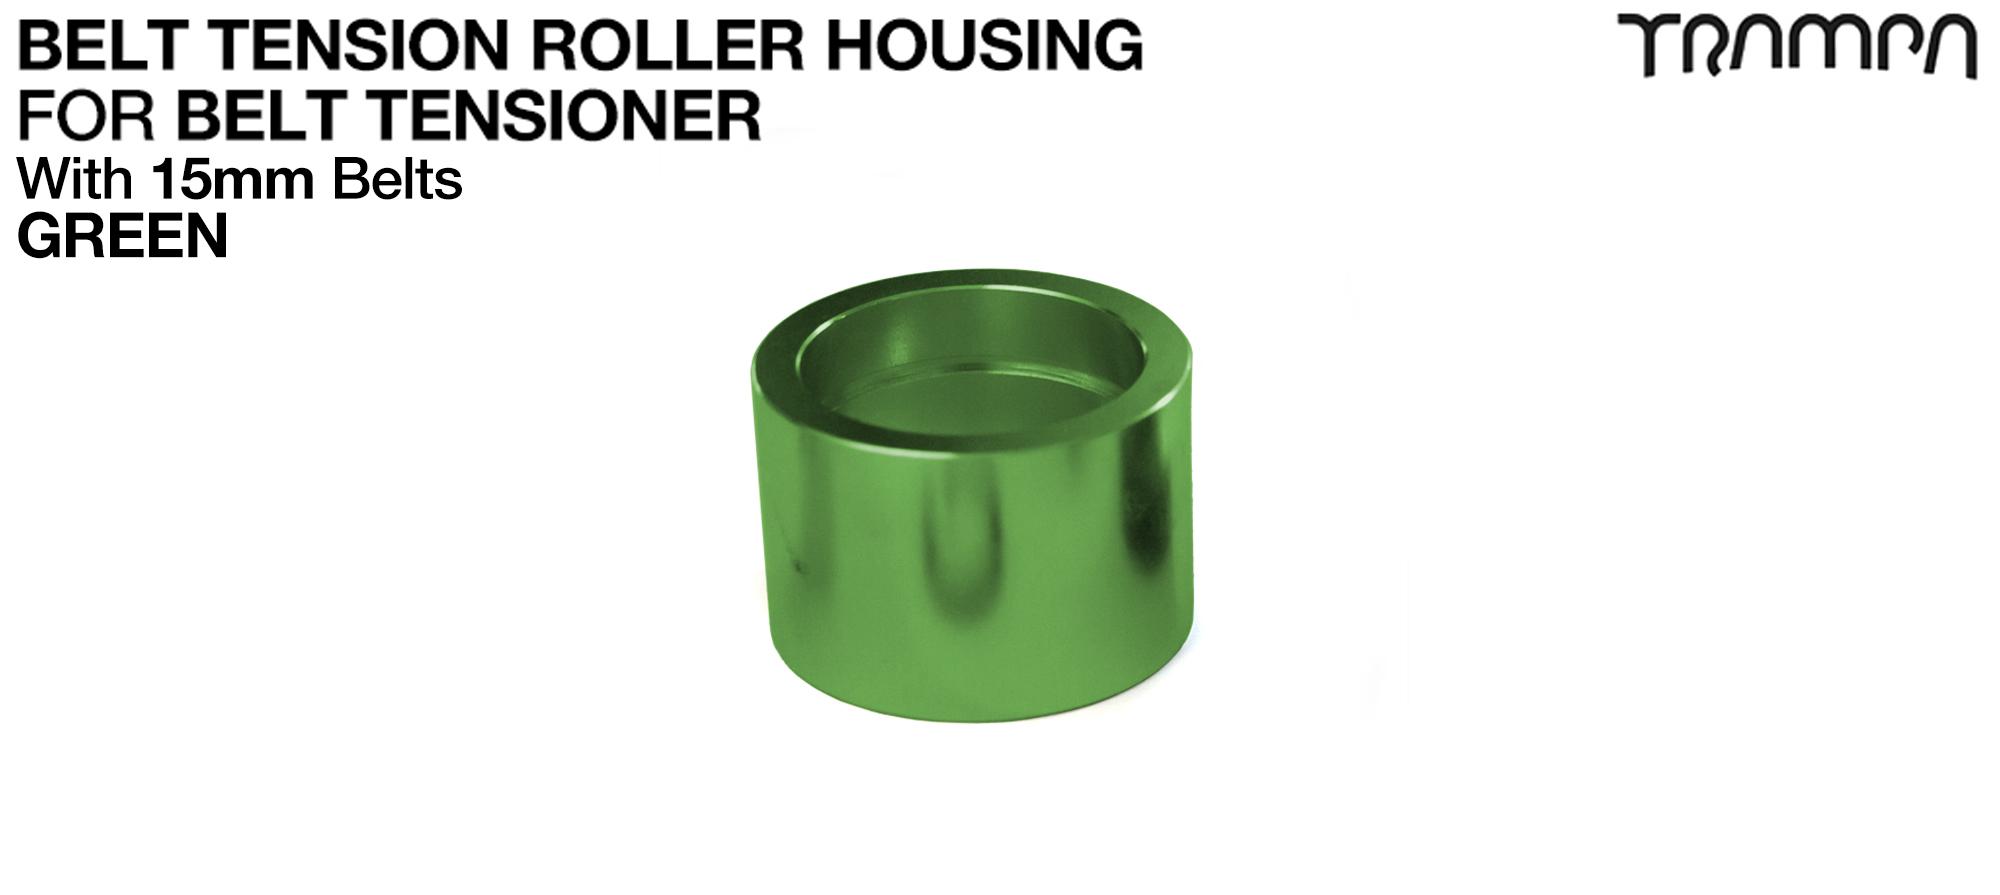 Belt Tension Roller Housing for 15mm Belts - GREEN